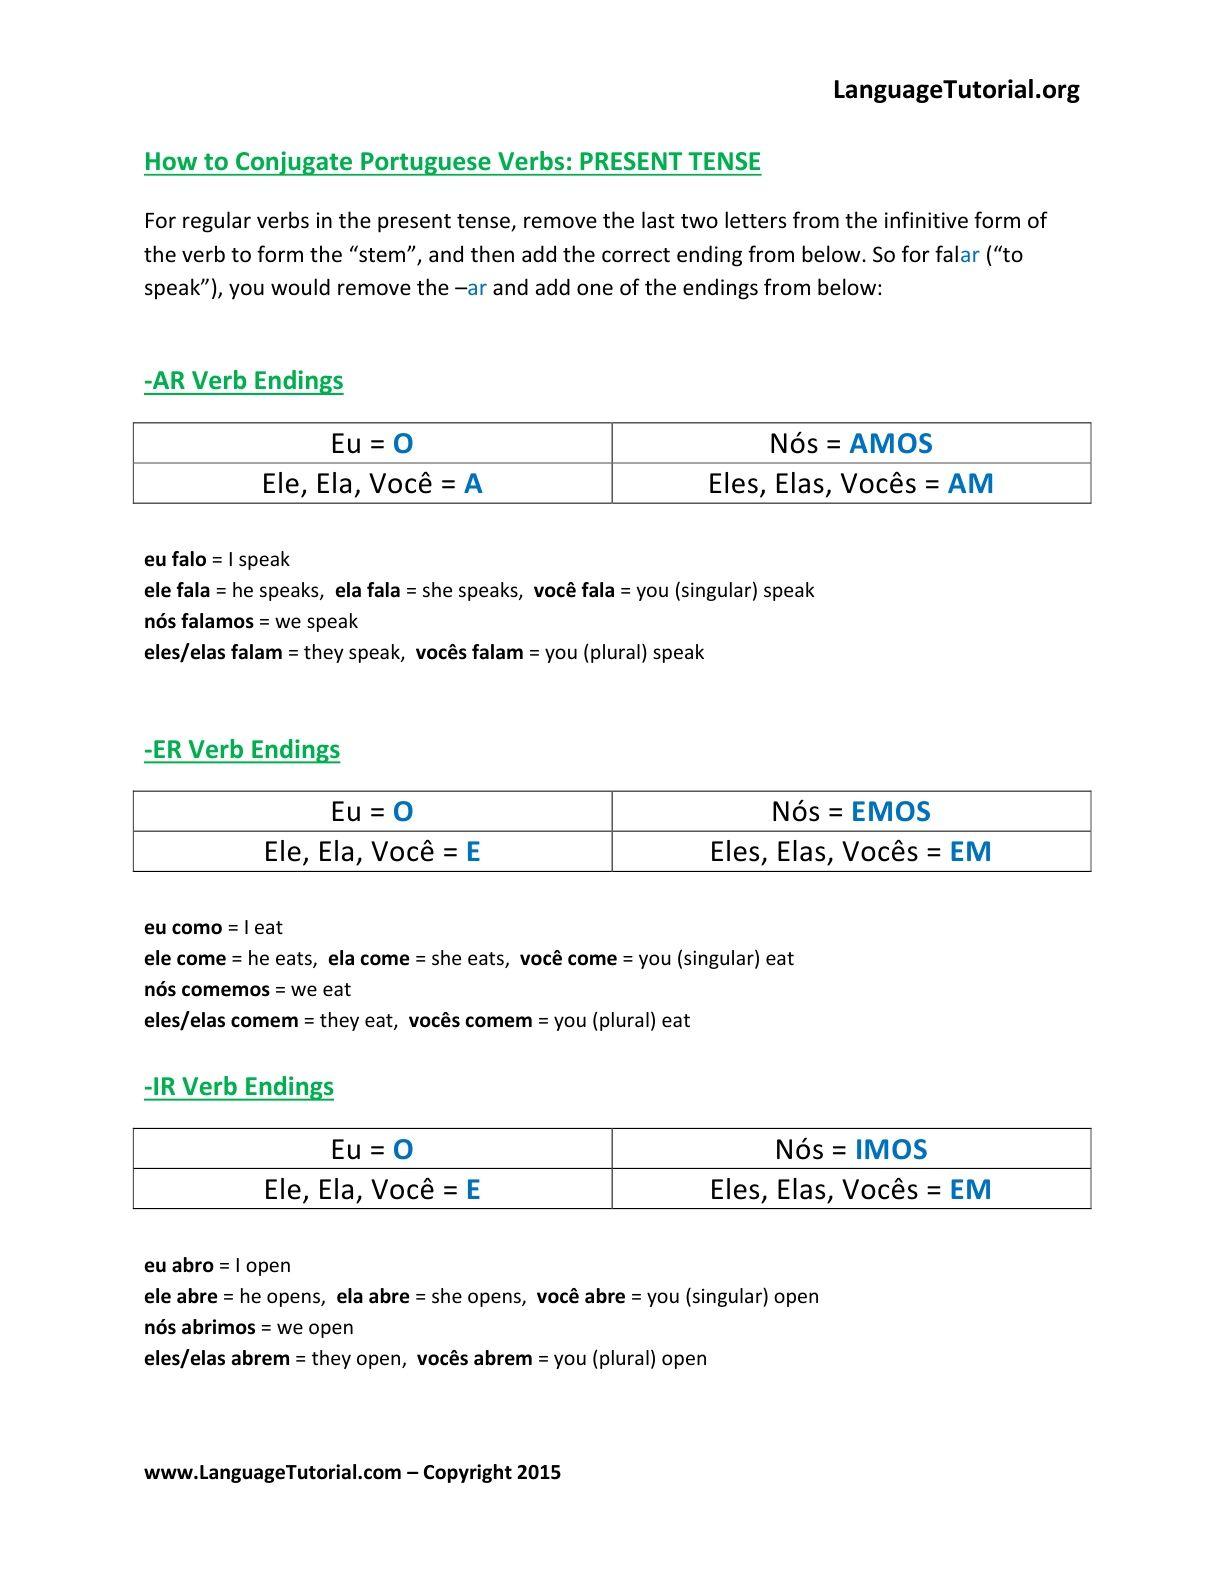 Free Portuguese Worksheets - Online & Printable | Portuguese - Free Printable Portuguese Worksheets